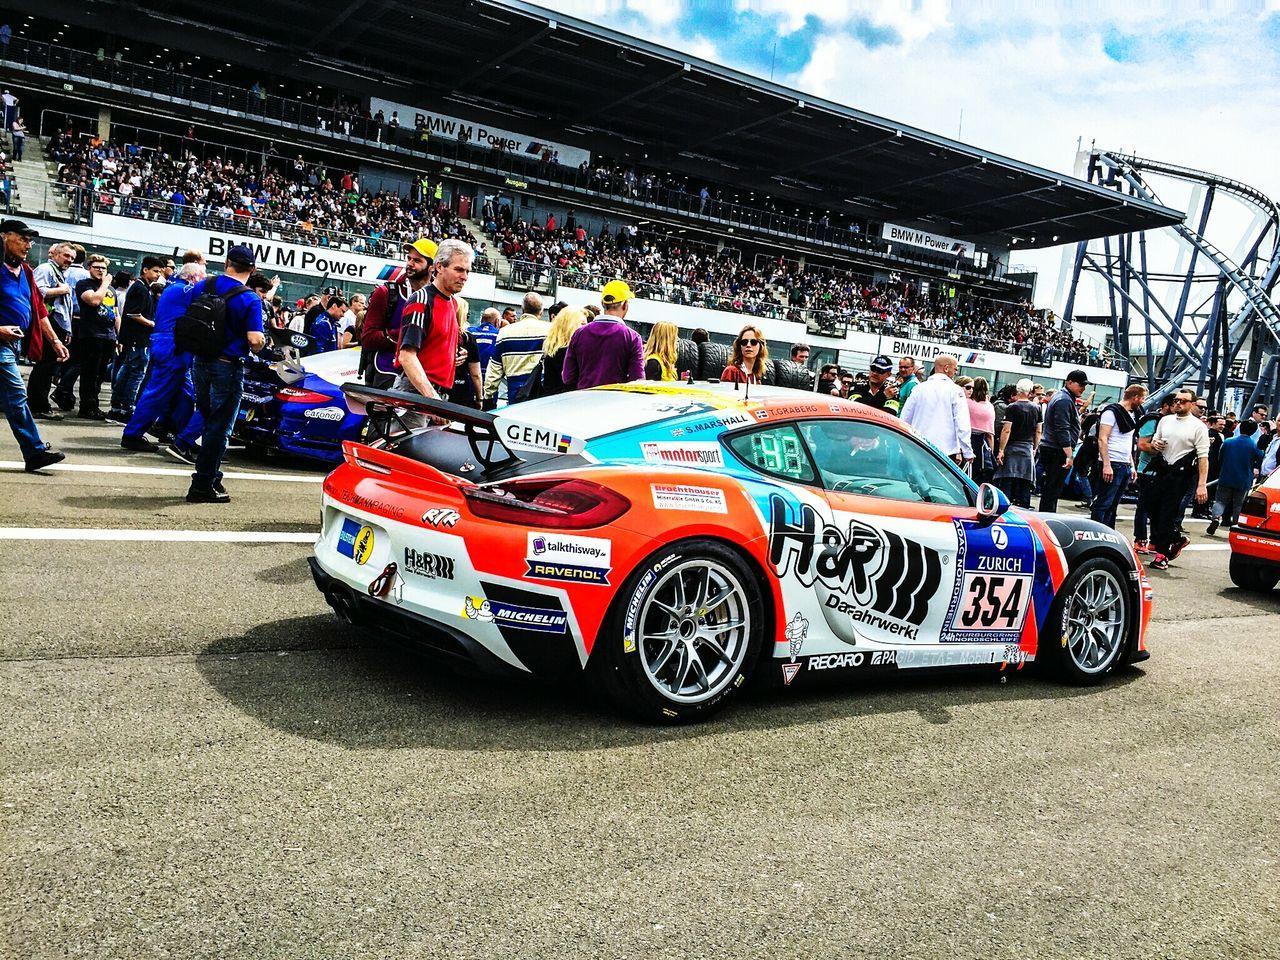 Porsche Rtr  Nurburgring 24h Race Motorsport Racing Nordschleife Race People Watching 24h